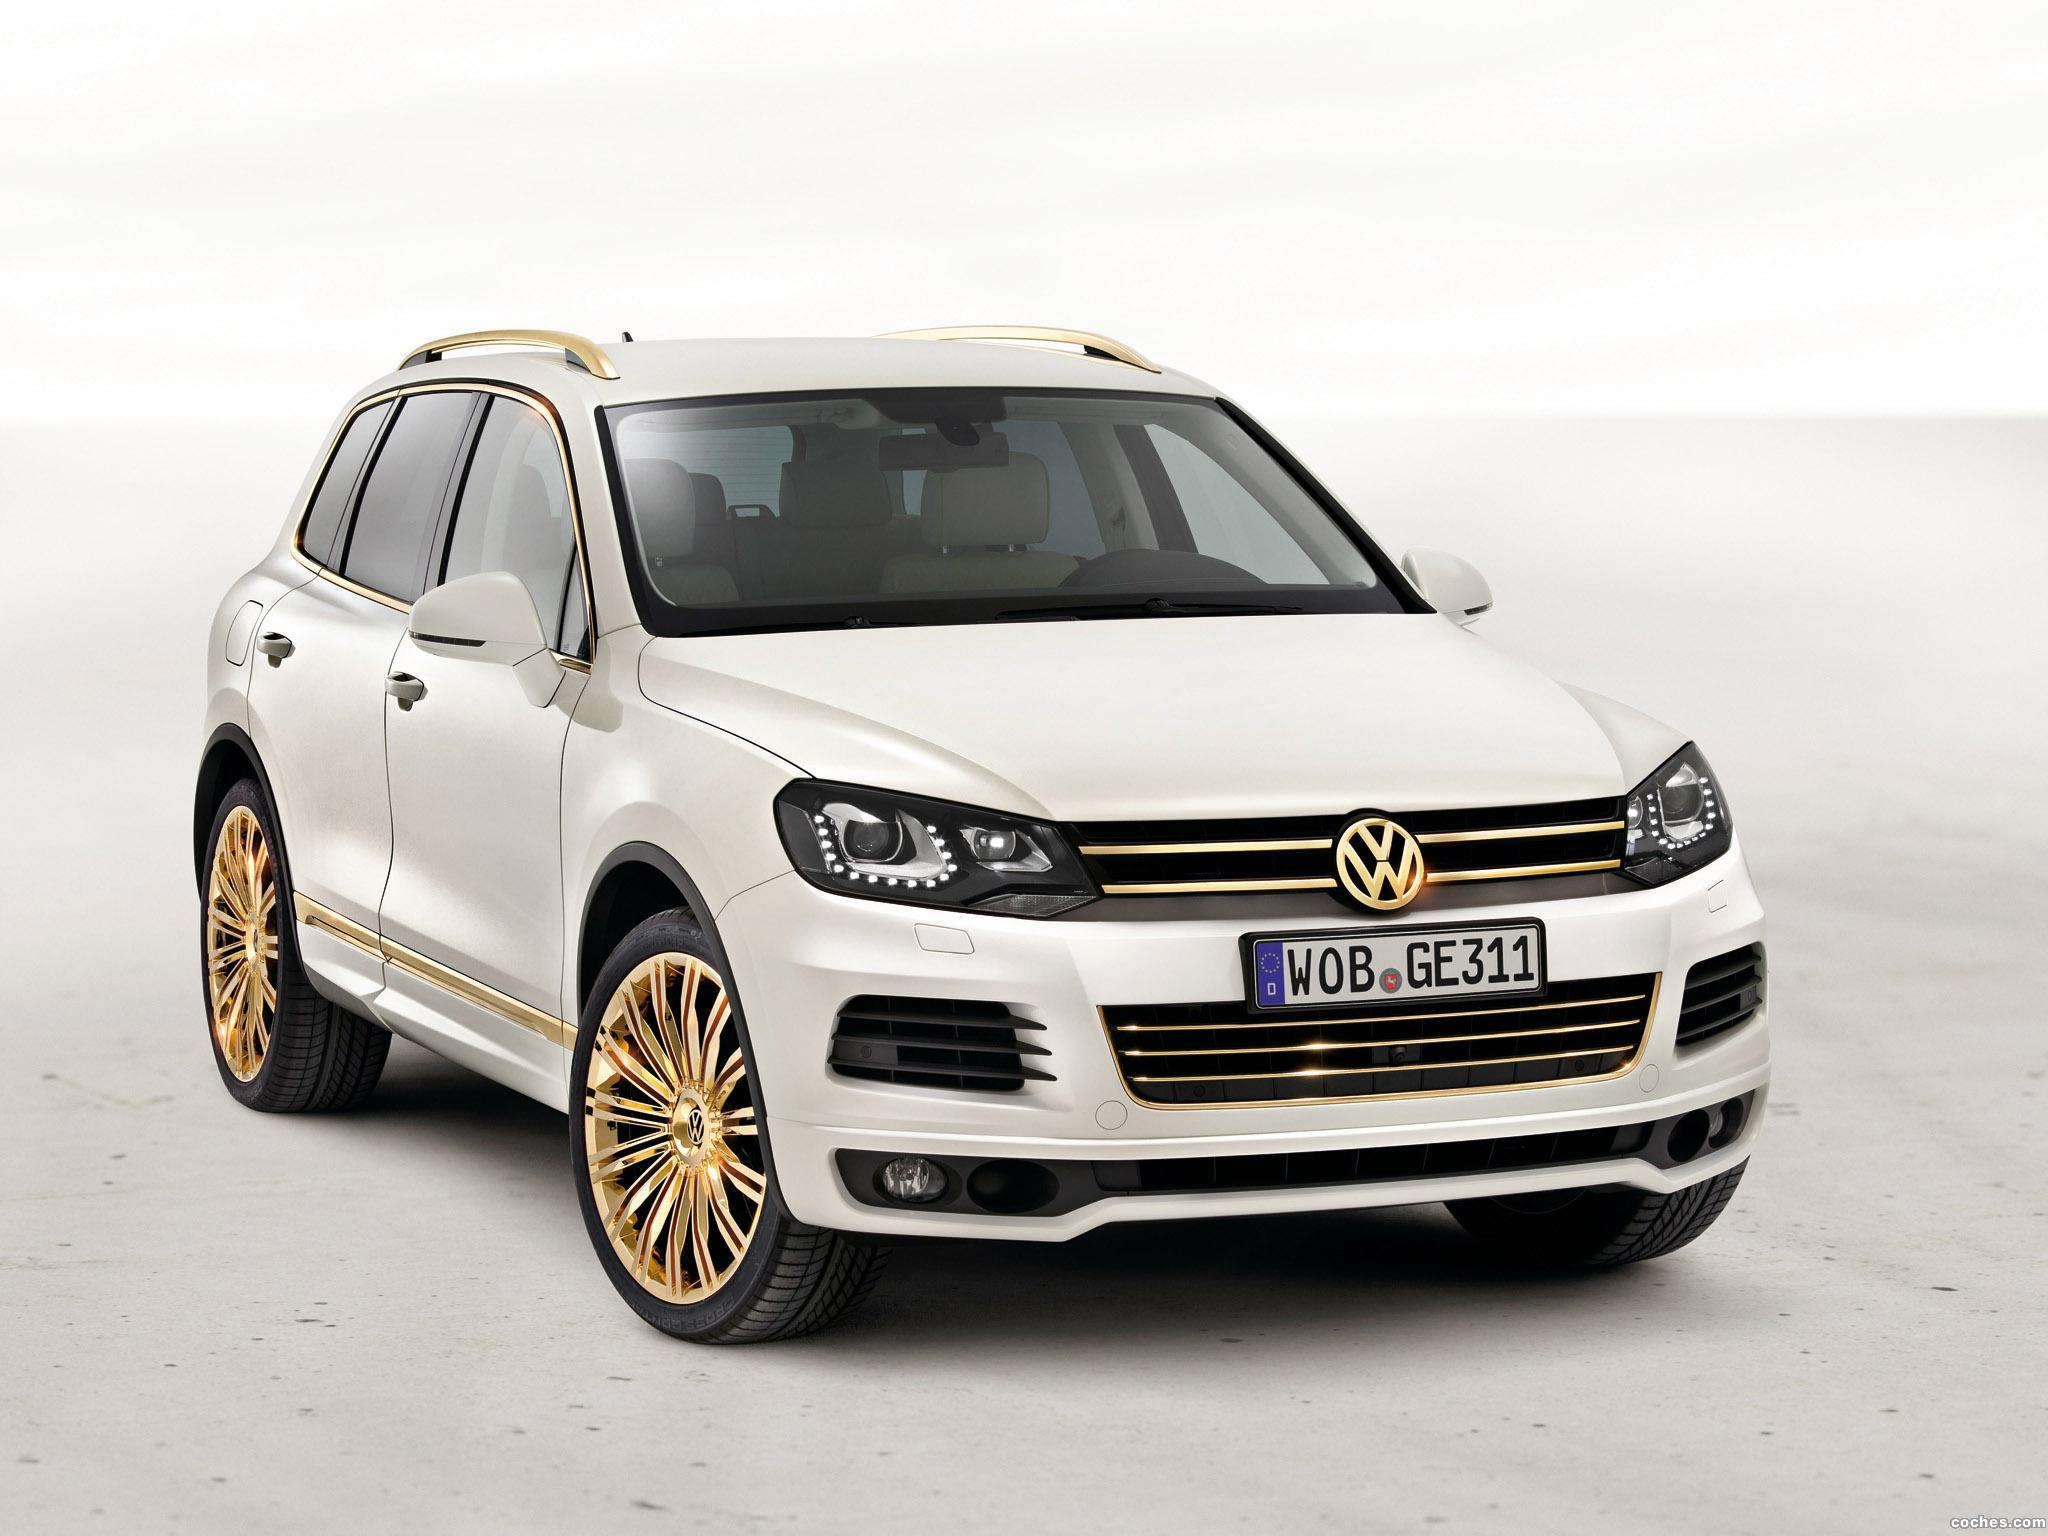 Foto 0 de Volkswagen Touareg V8 TDi Gold Edition Concept 2011